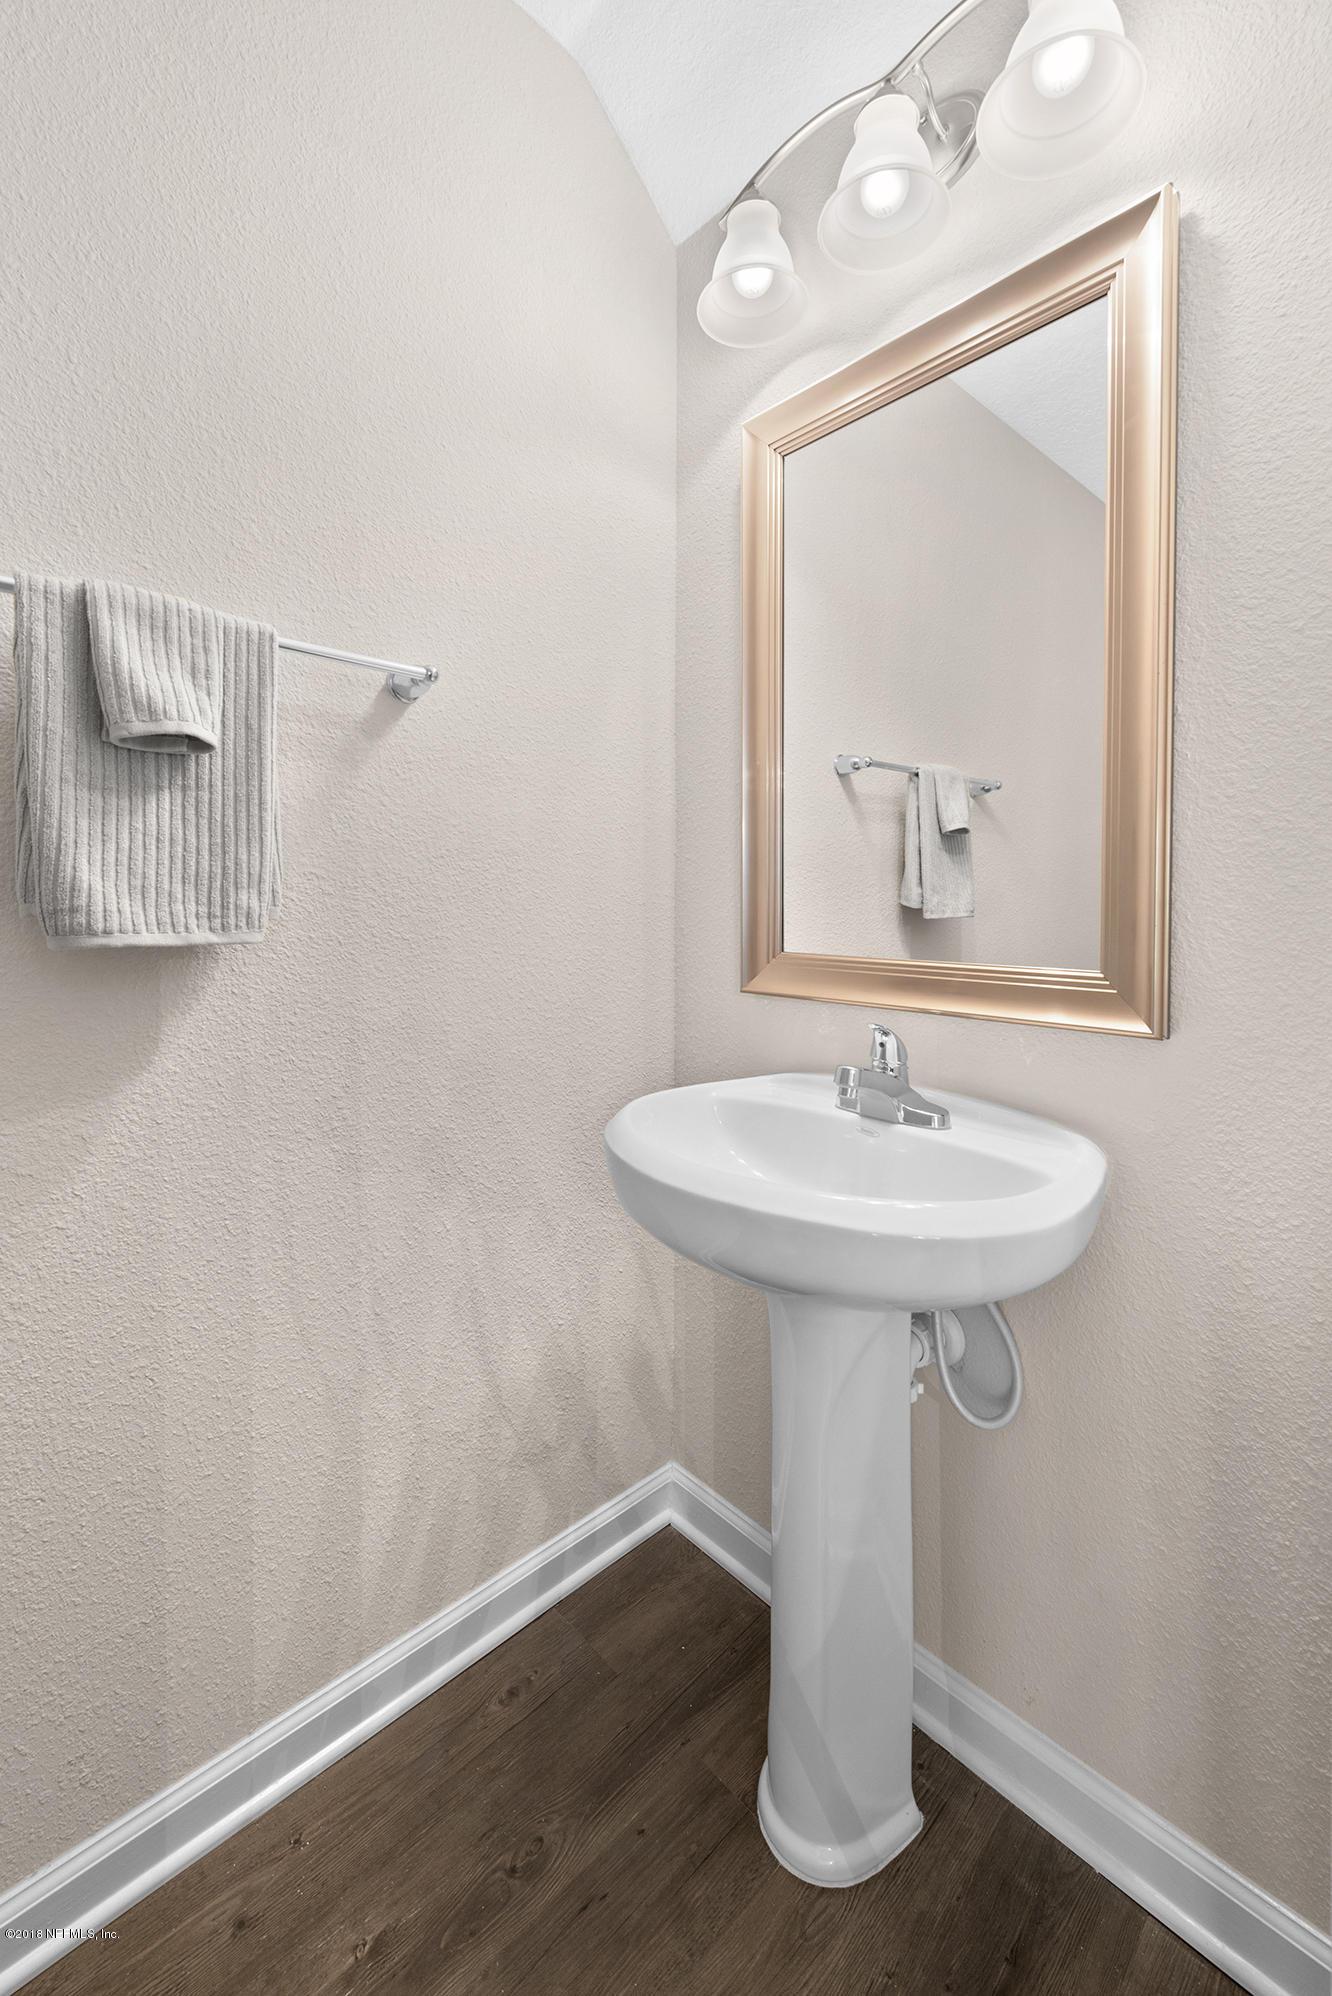 2830 SHANGRI LA, JACKSONVILLE, FLORIDA 32233, 4 Bedrooms Bedrooms, ,2 BathroomsBathrooms,Residential - townhome,For sale,SHANGRI LA,951554